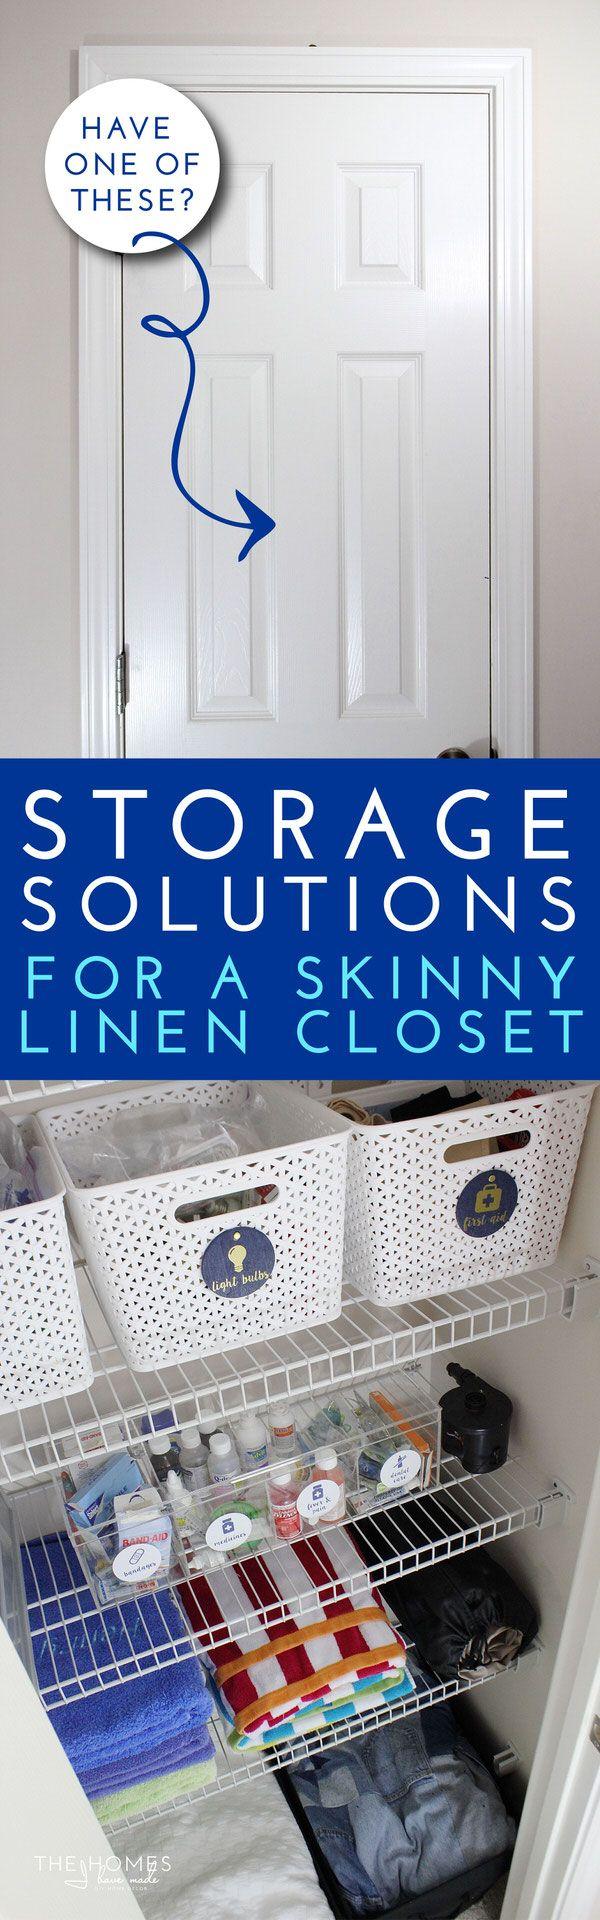 129 Best Organized Closets Images On Pinterest